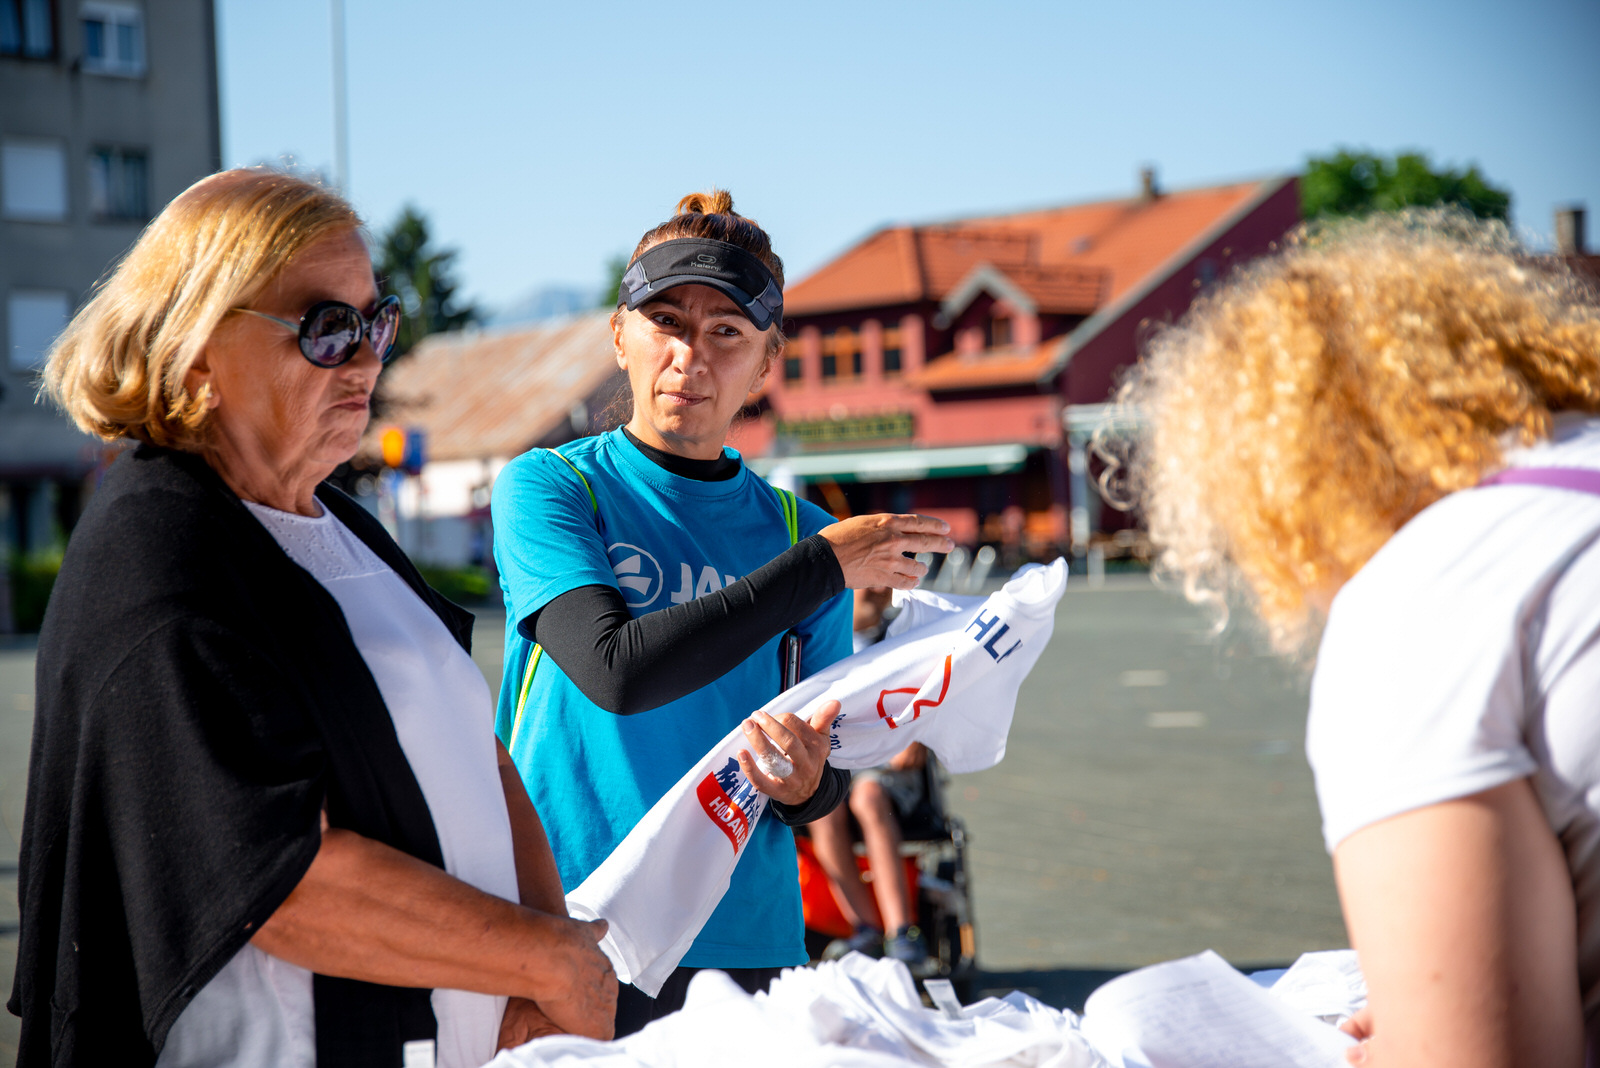 likaclub_gospić_hodanjem do zdravlja 2020 (5)